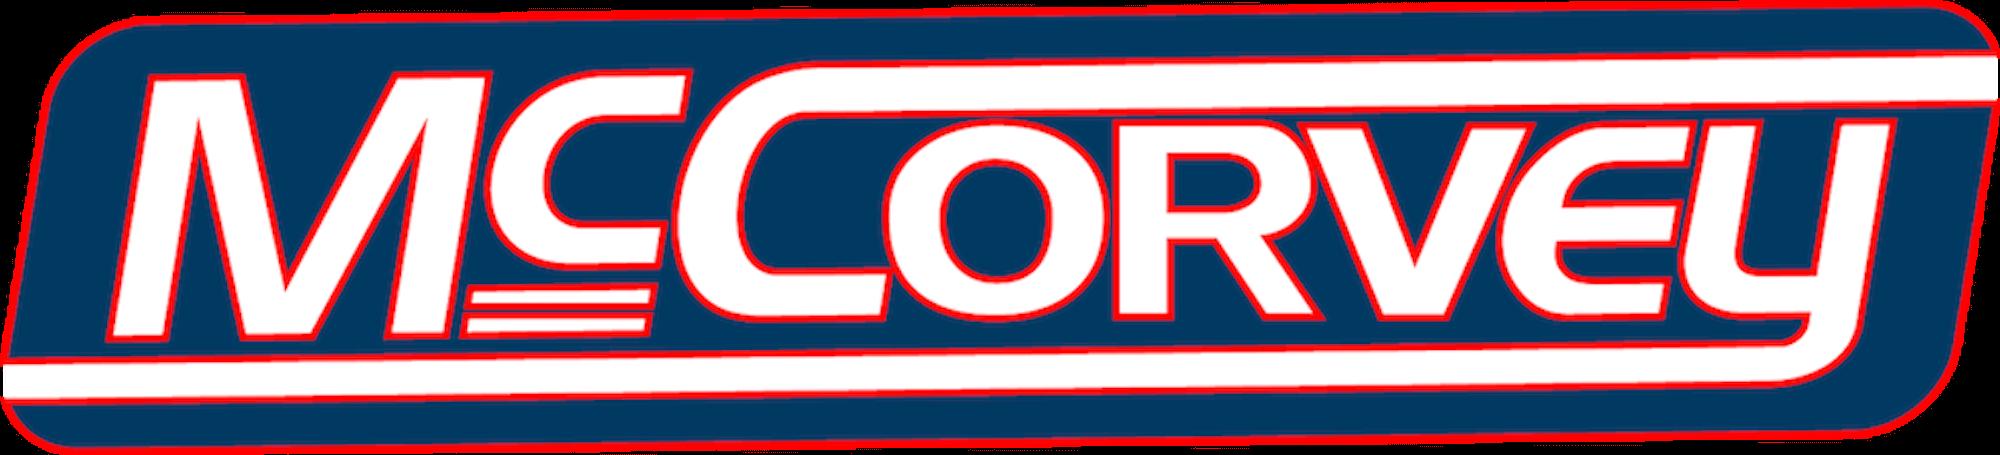 McCorvey のロゴ